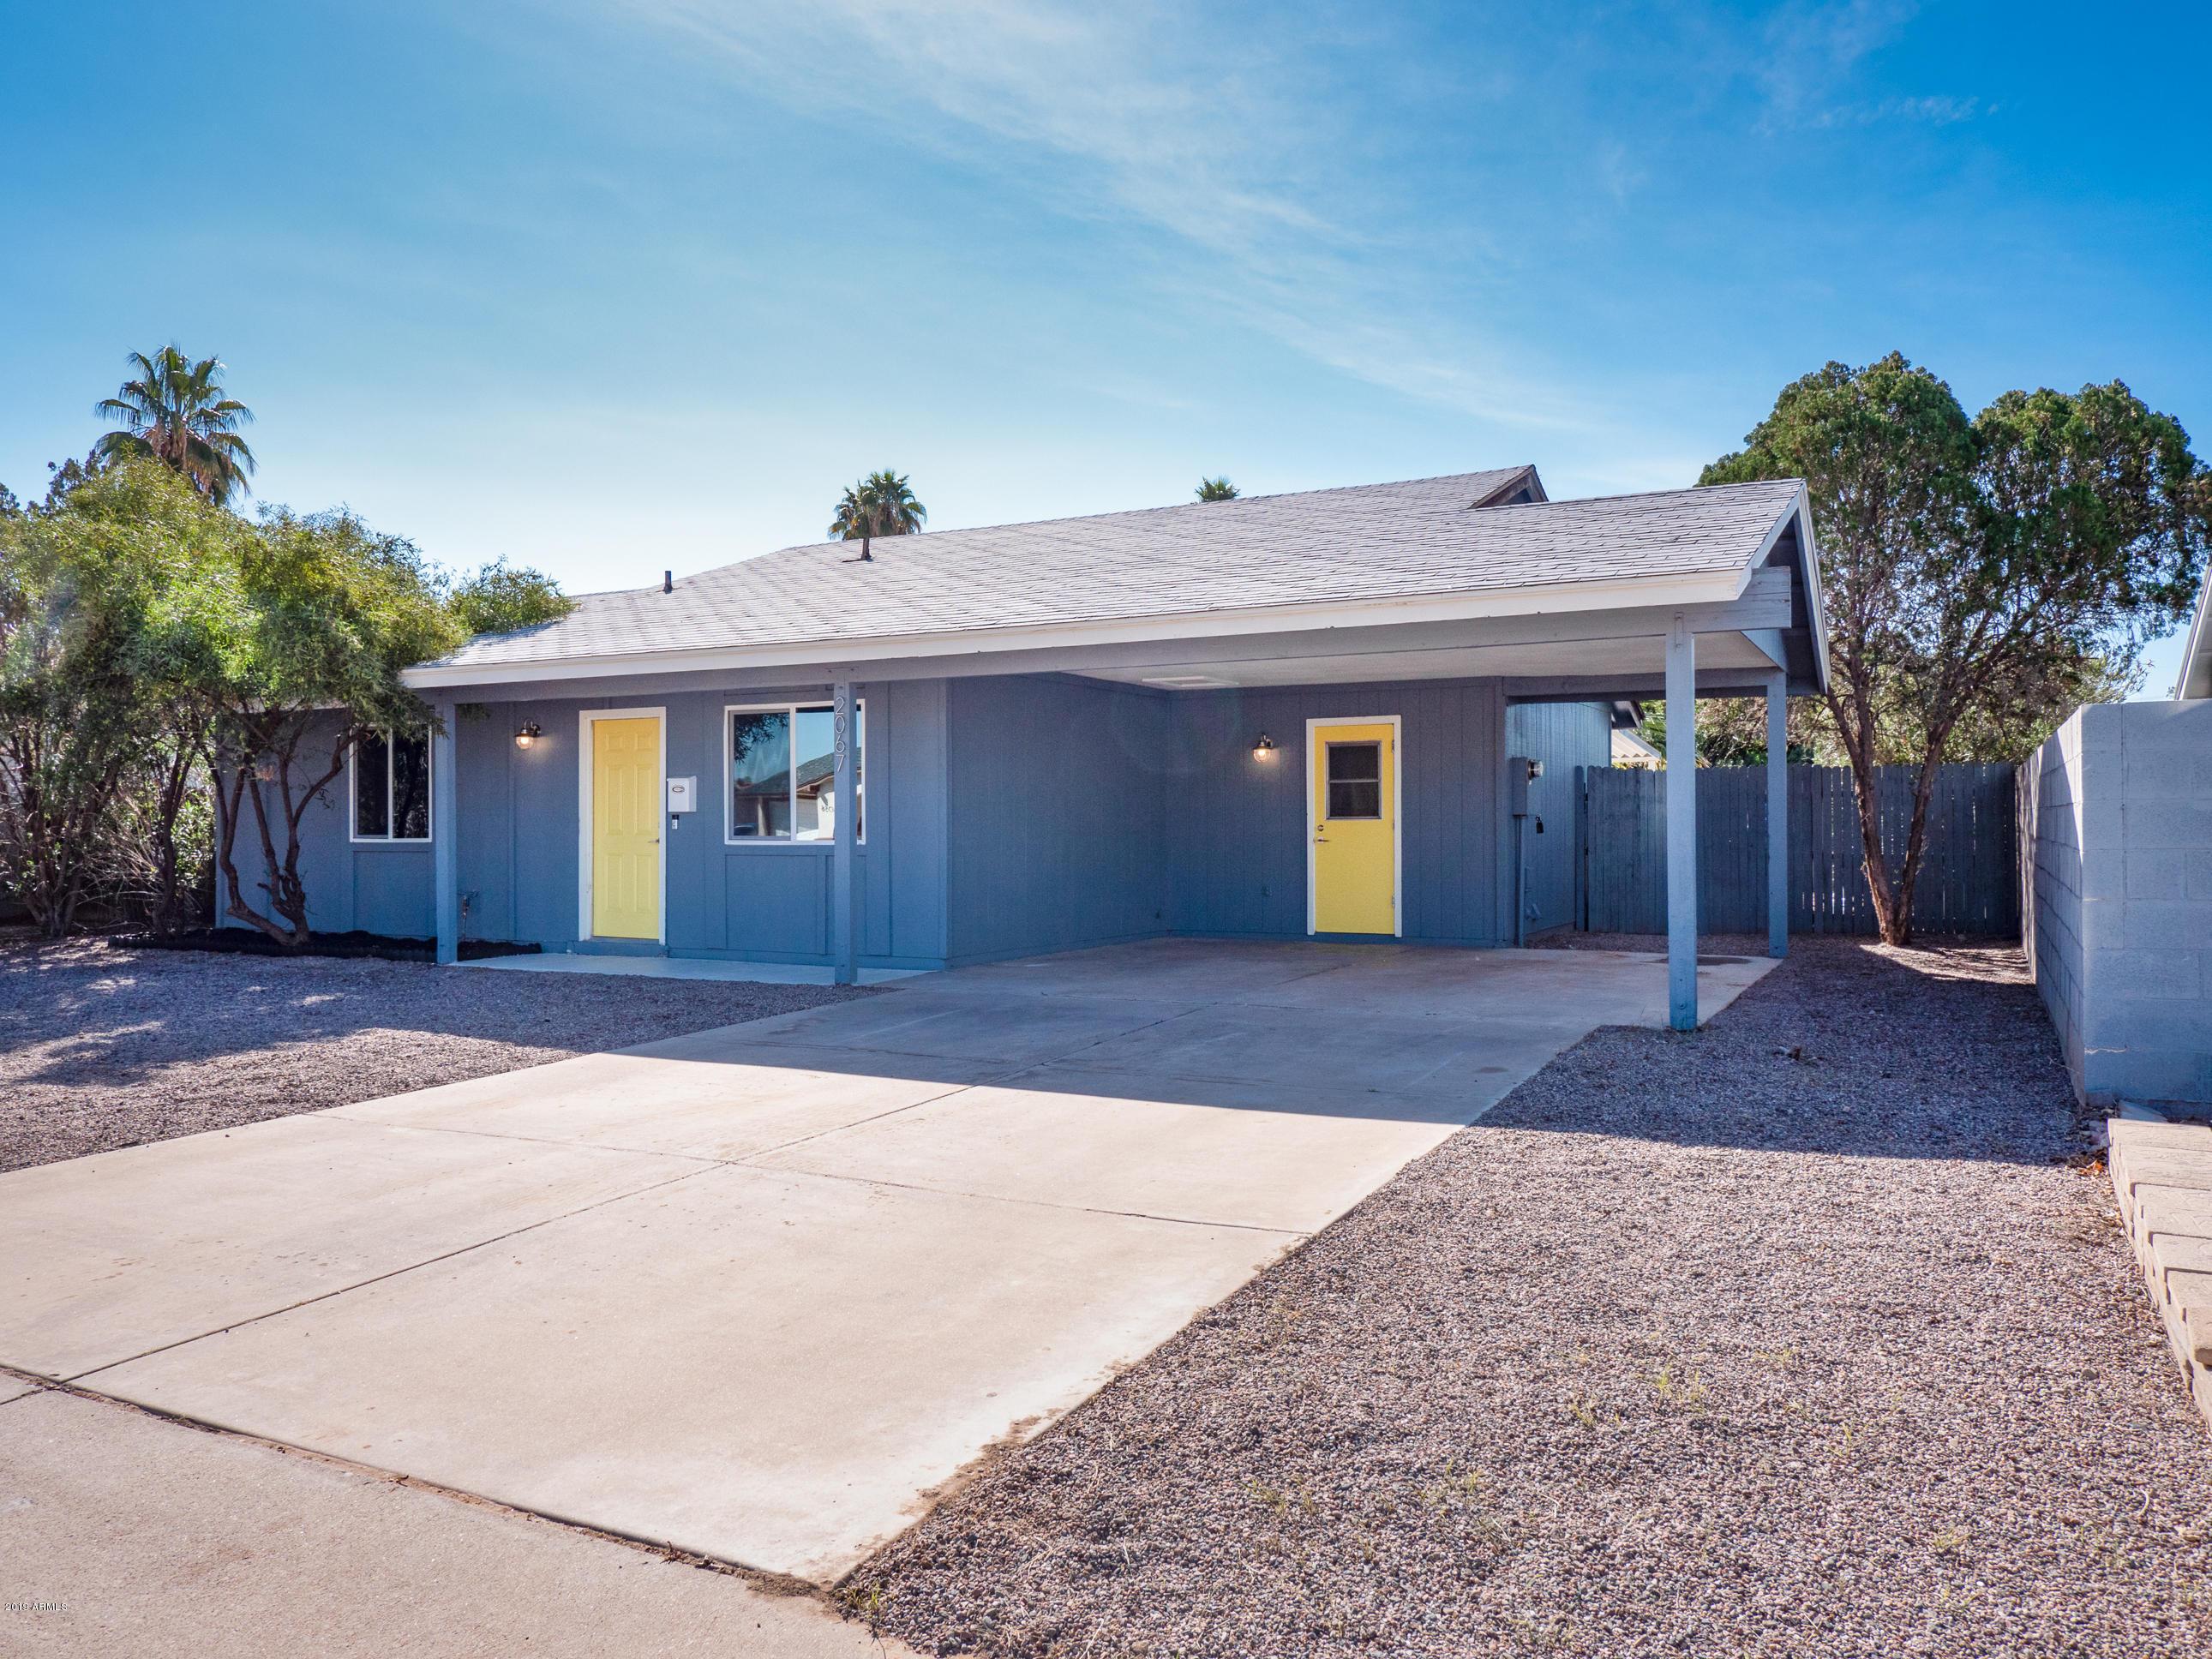 Photo of 2067 W PLATA Avenue, Mesa, AZ 85202